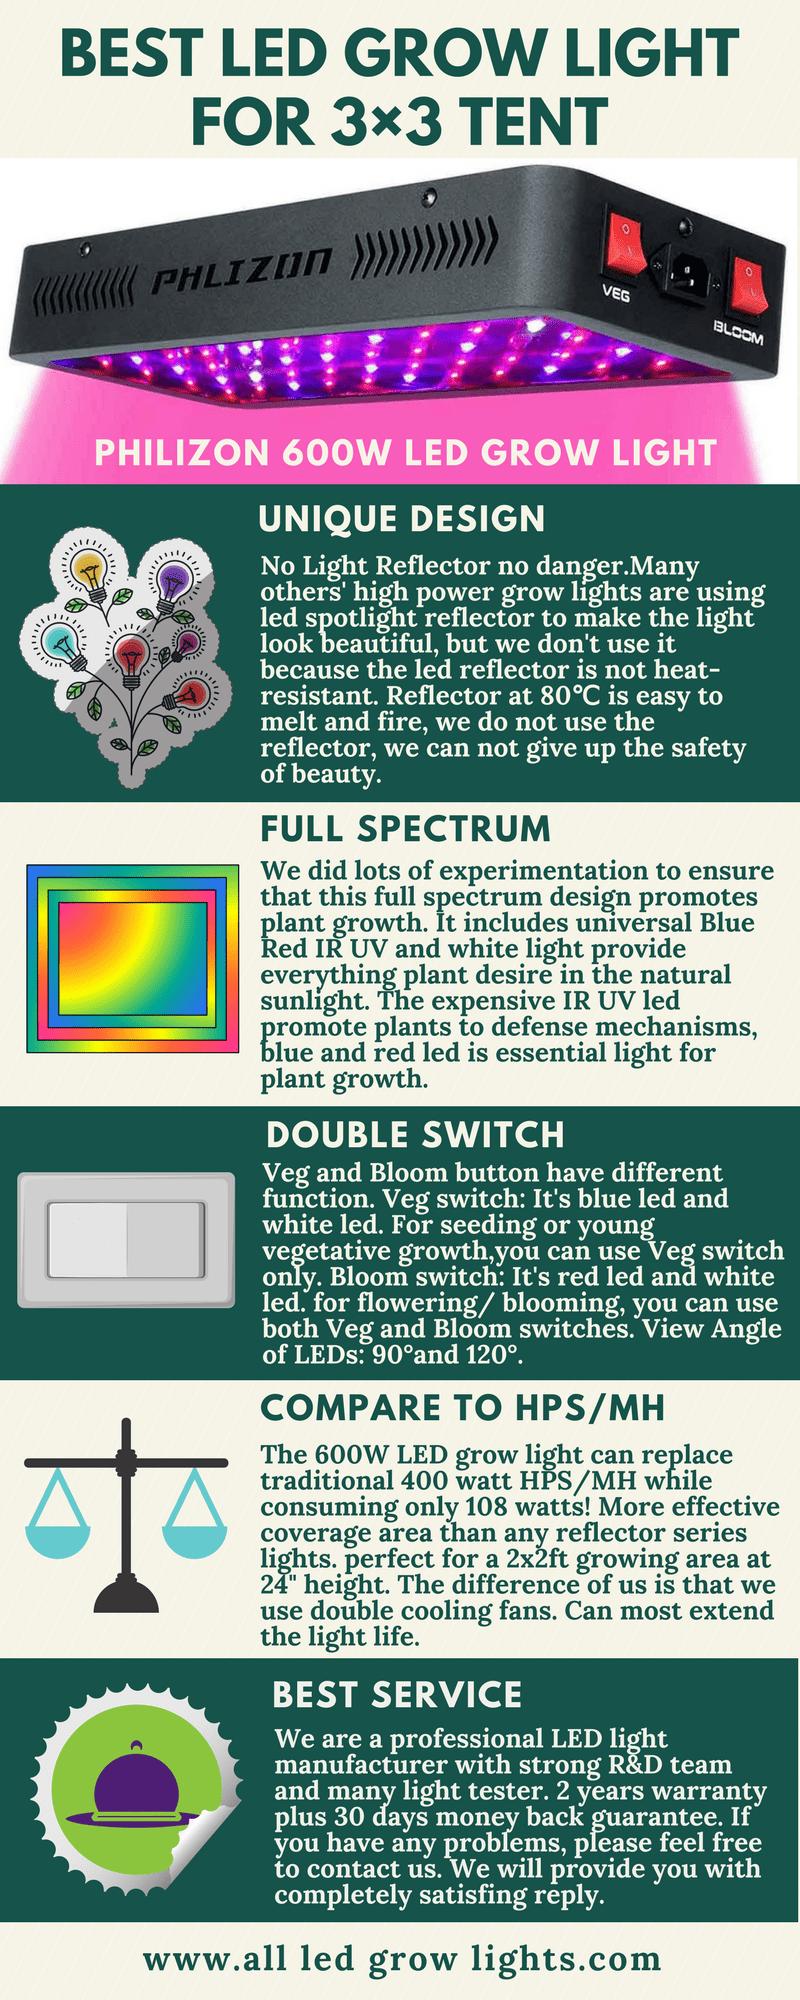 Led grow light for 3x3 grow tent infographic